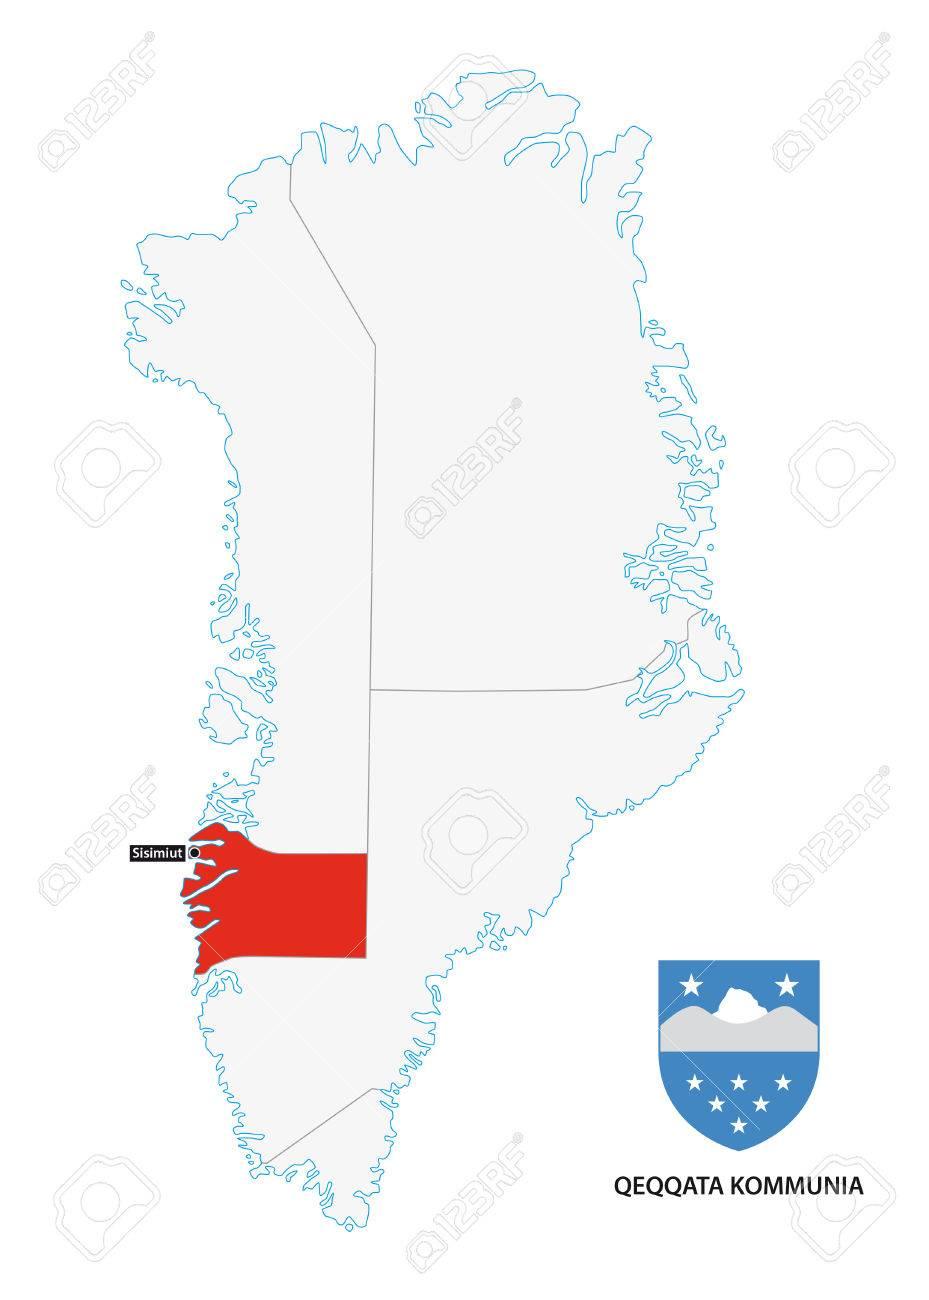 Administrative Map Of Greenland Qeqqata Municipality With Coat